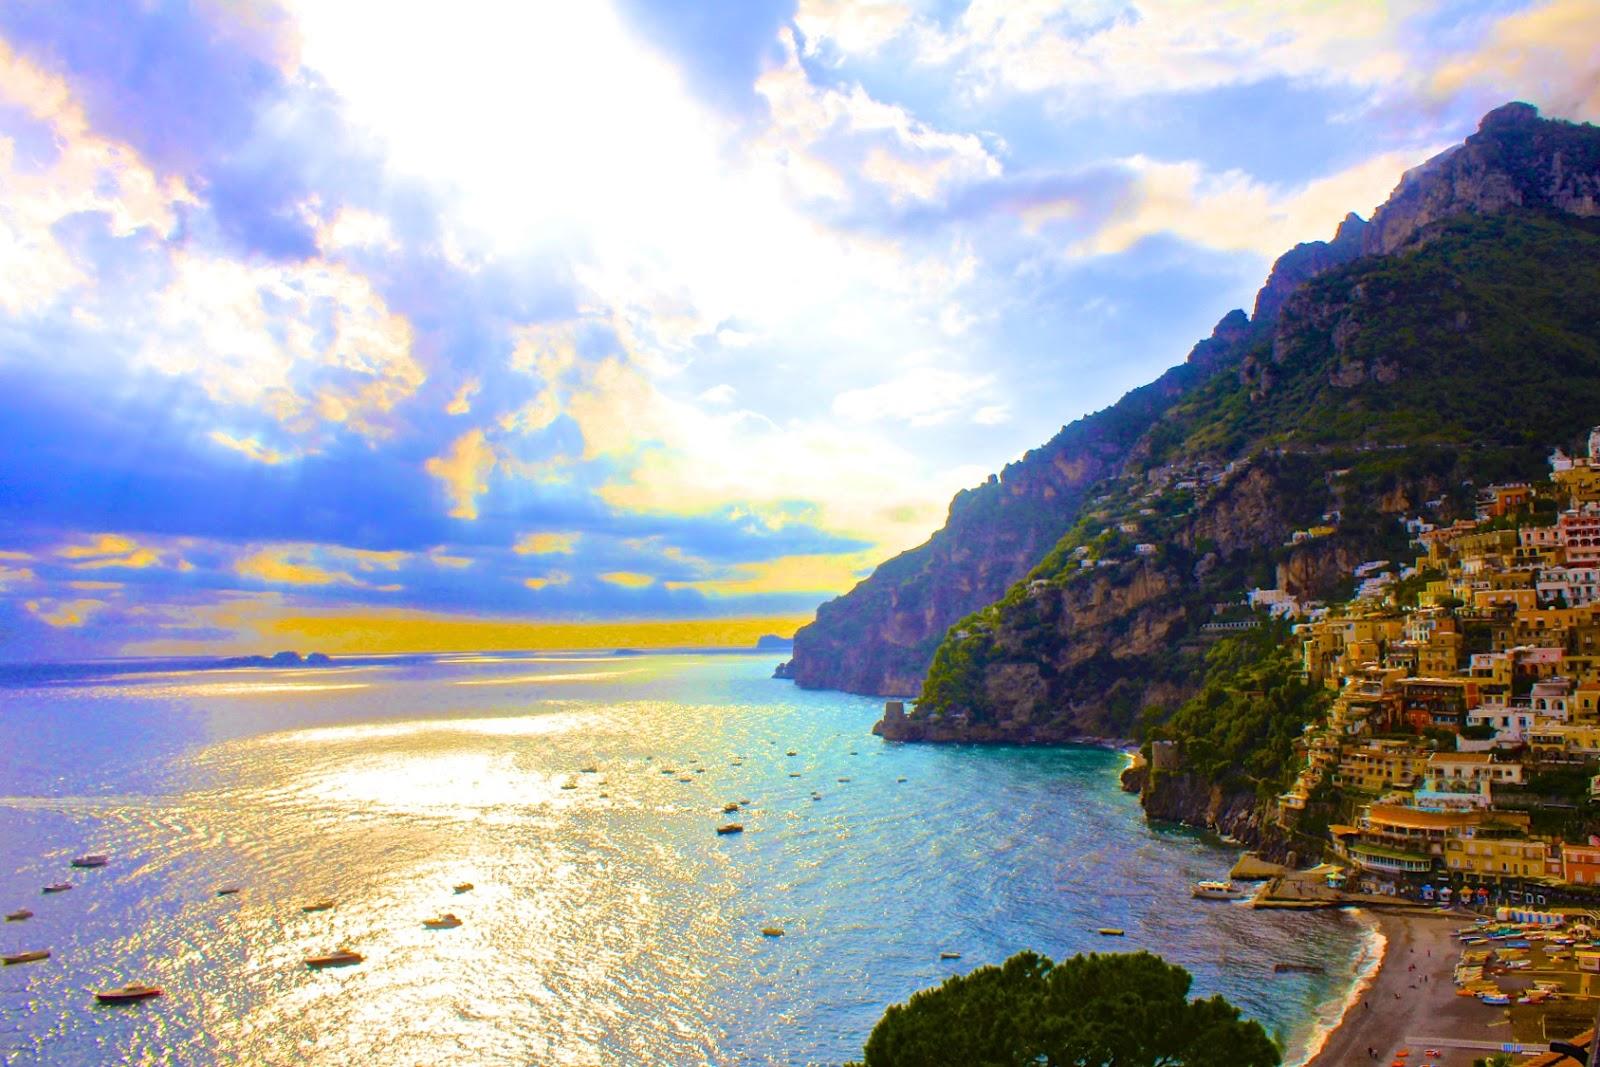 La Dolce Vita Discovering Authenticity Amalfi Coast